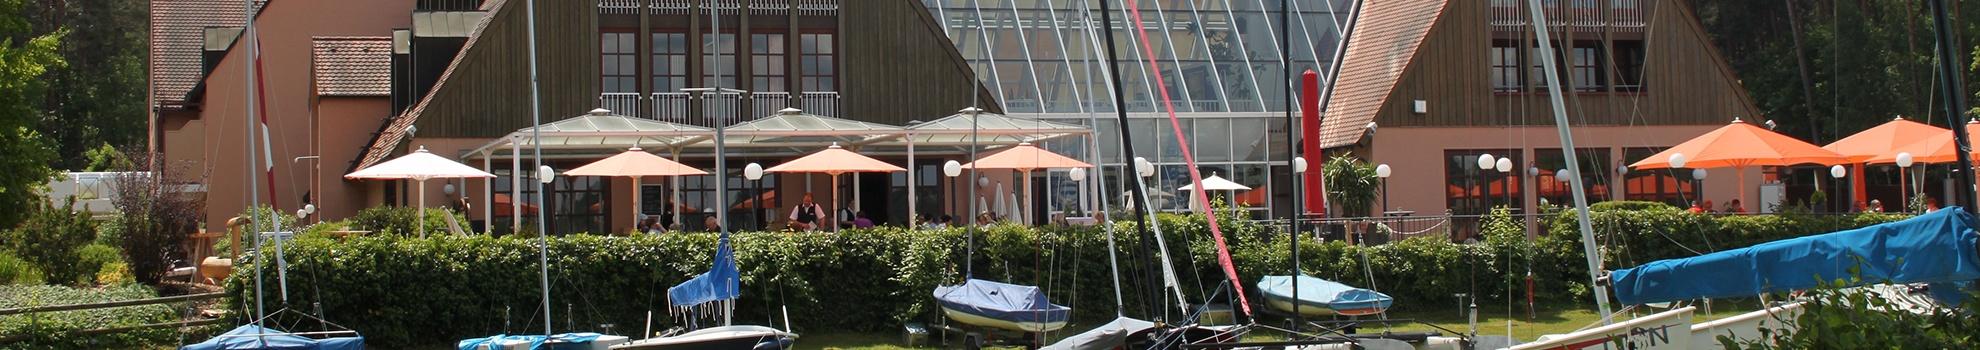 Aktivresort Strandhotel Seehof - Terrasse